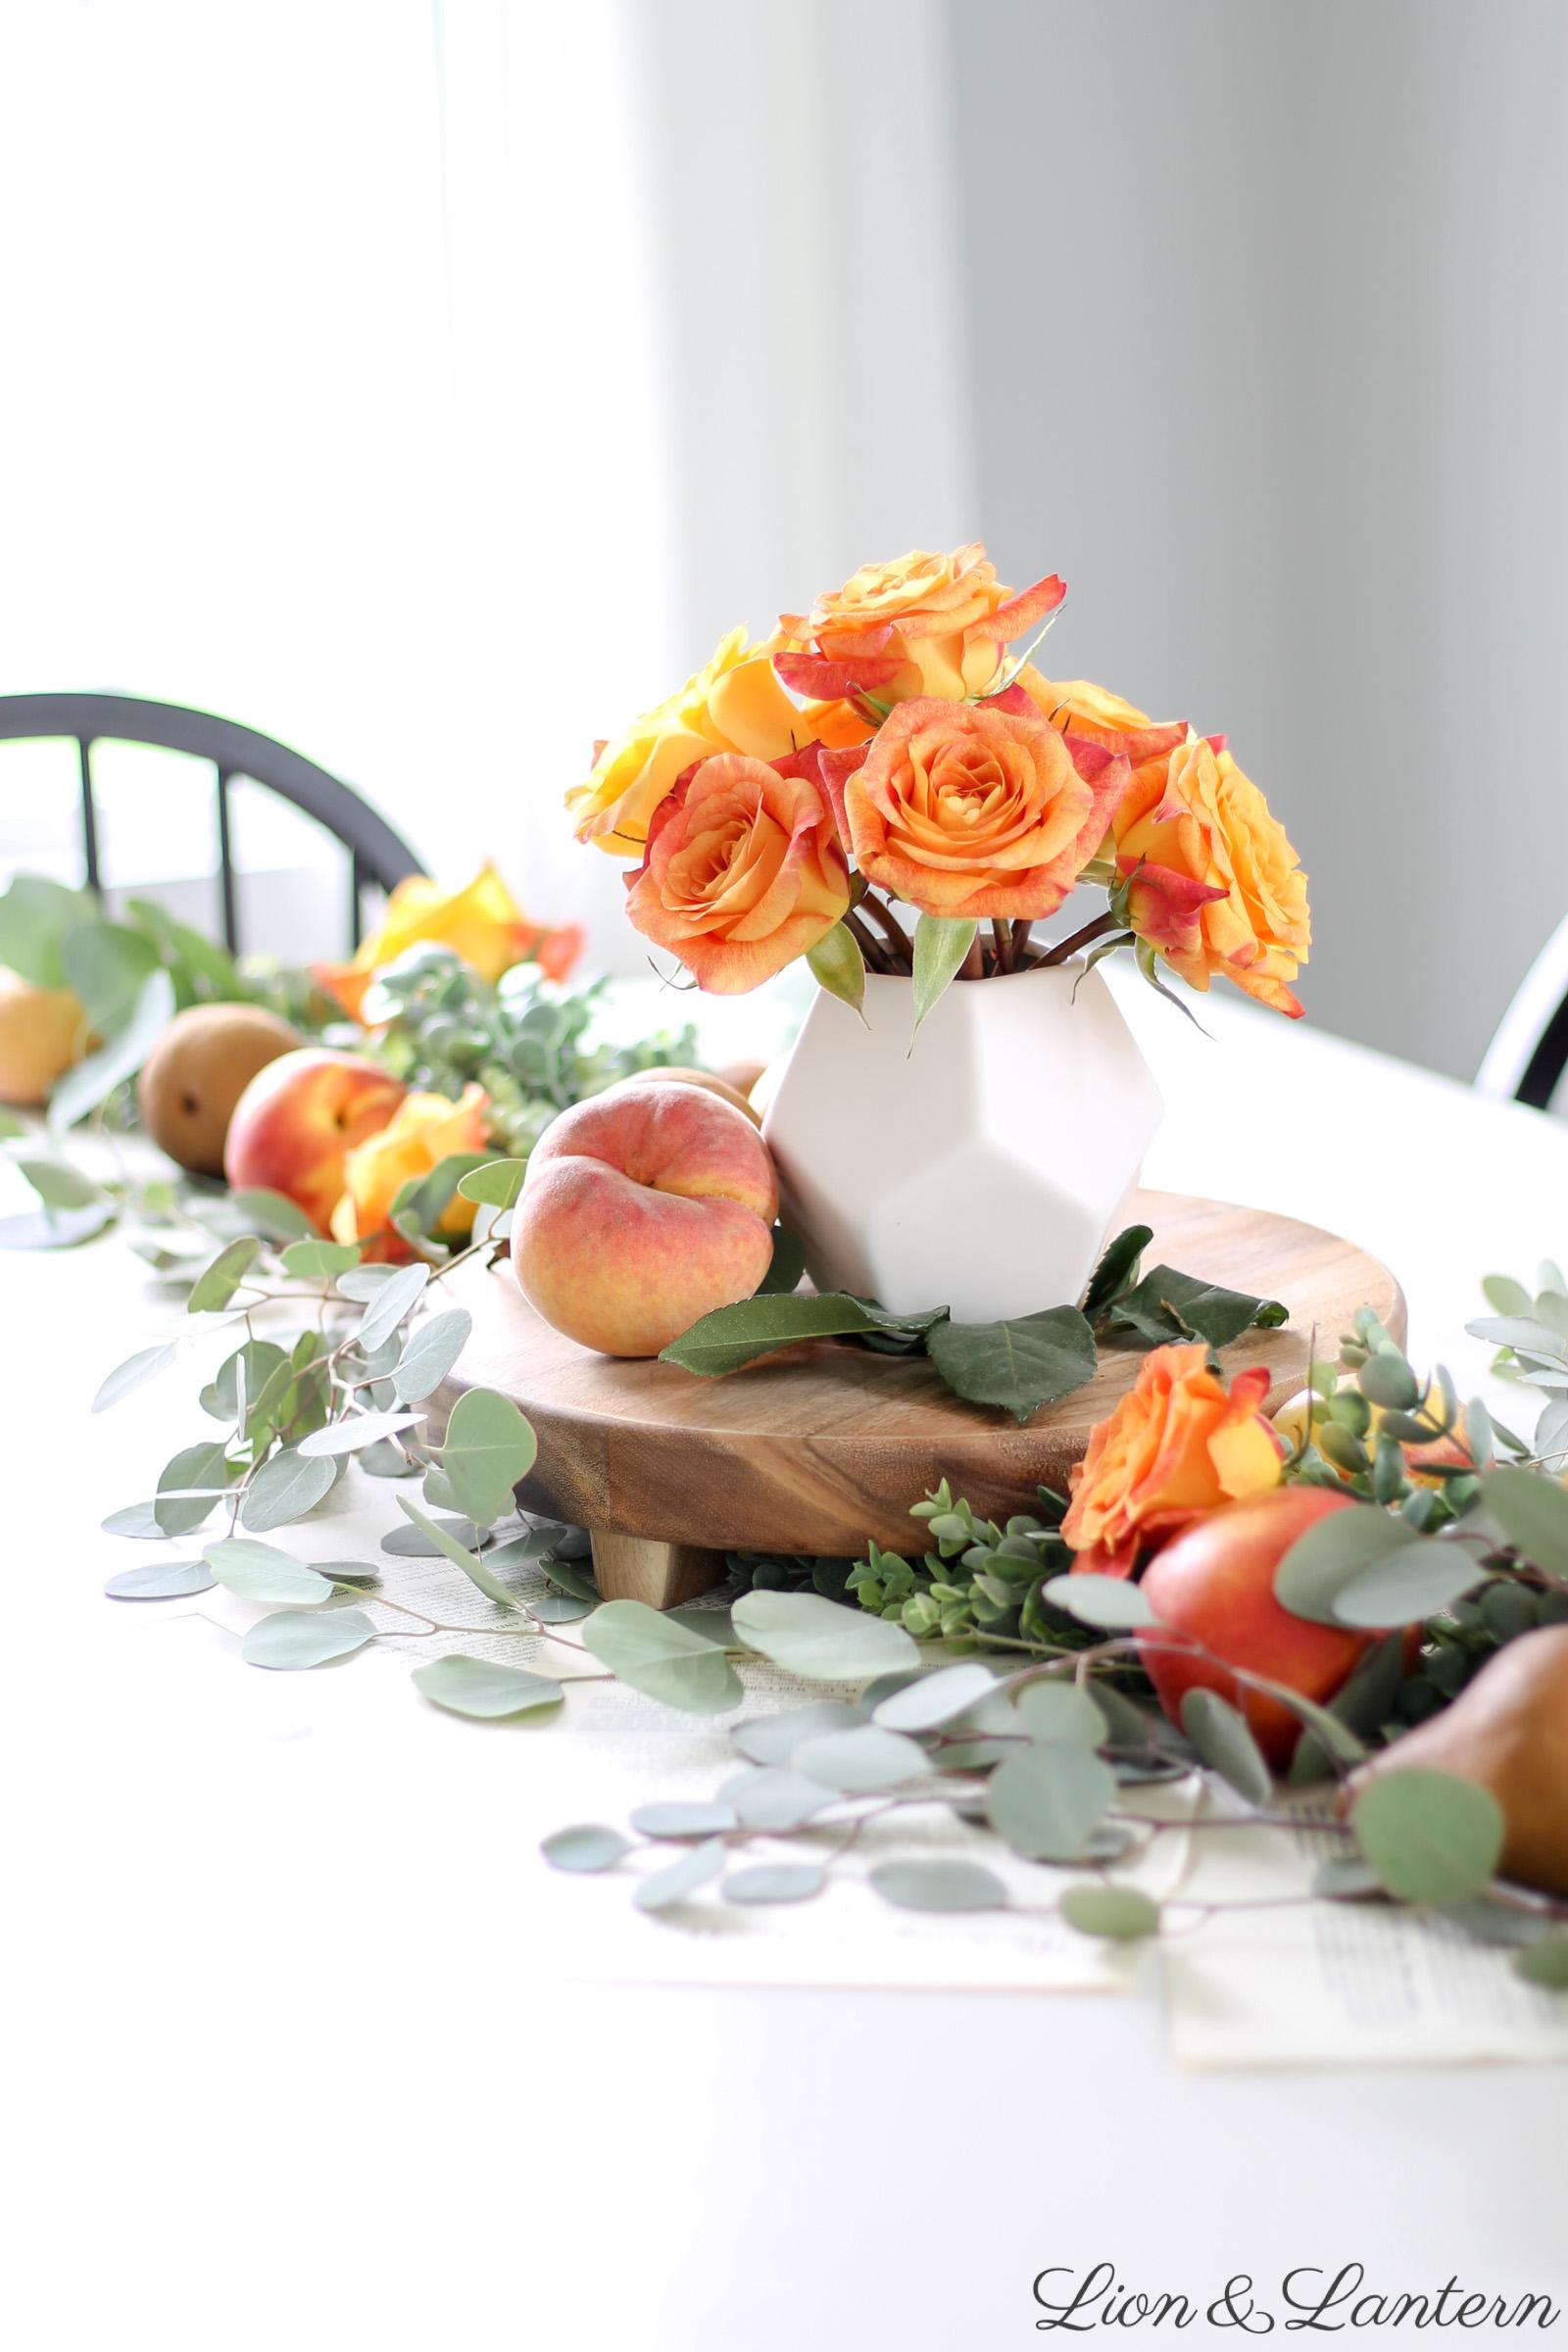 Fruit & Eucalyptus Fall Table at LionAndLantern.com   fall home tour, fall farmhouse decor, fall tablescape, autumn decor, peaches, pears, botanical prints